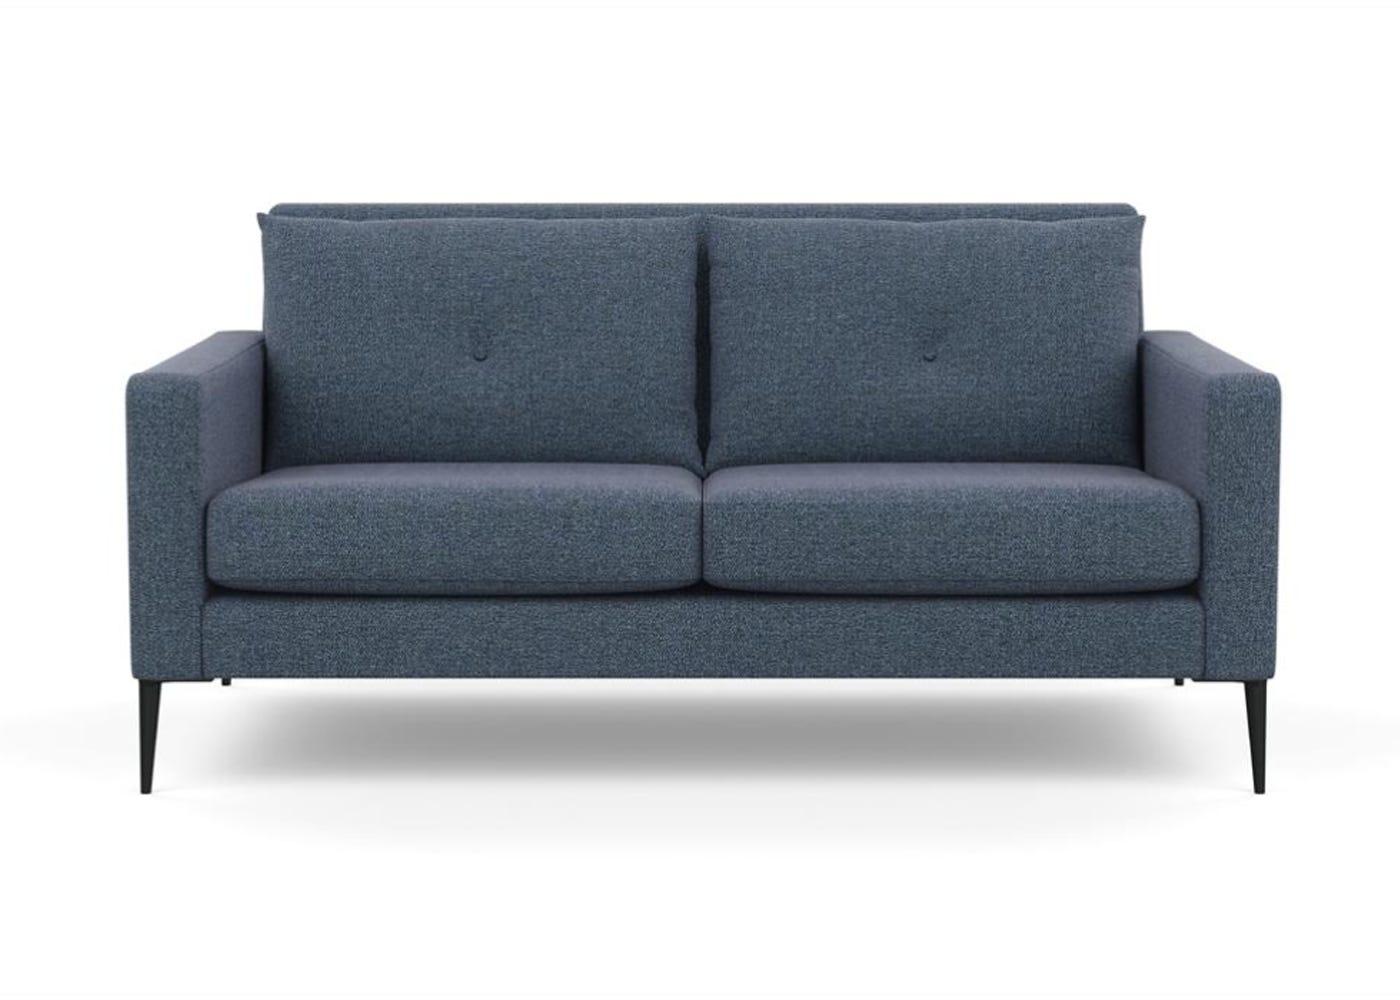 Heal's Brunel 2 Seater Sofa Estelle Blue